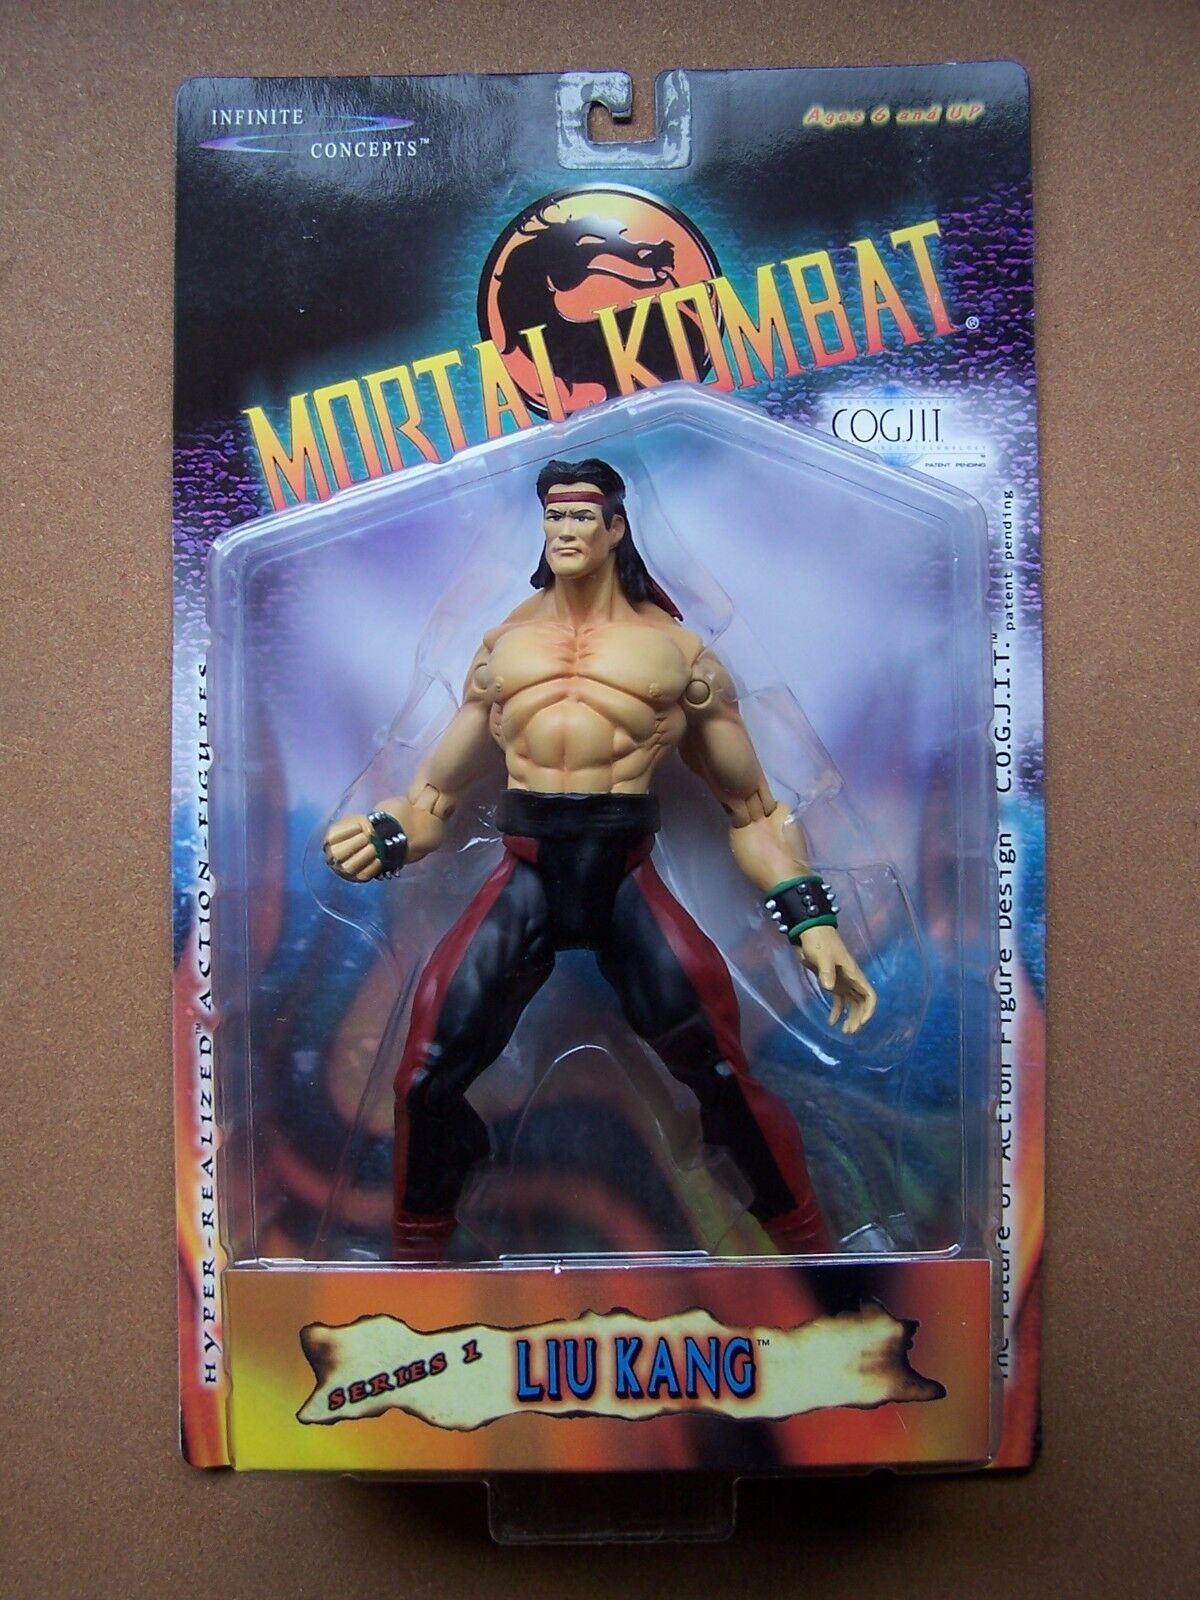 Mortal Kombat LIU KANG Infinite Concepts 2000 8.5